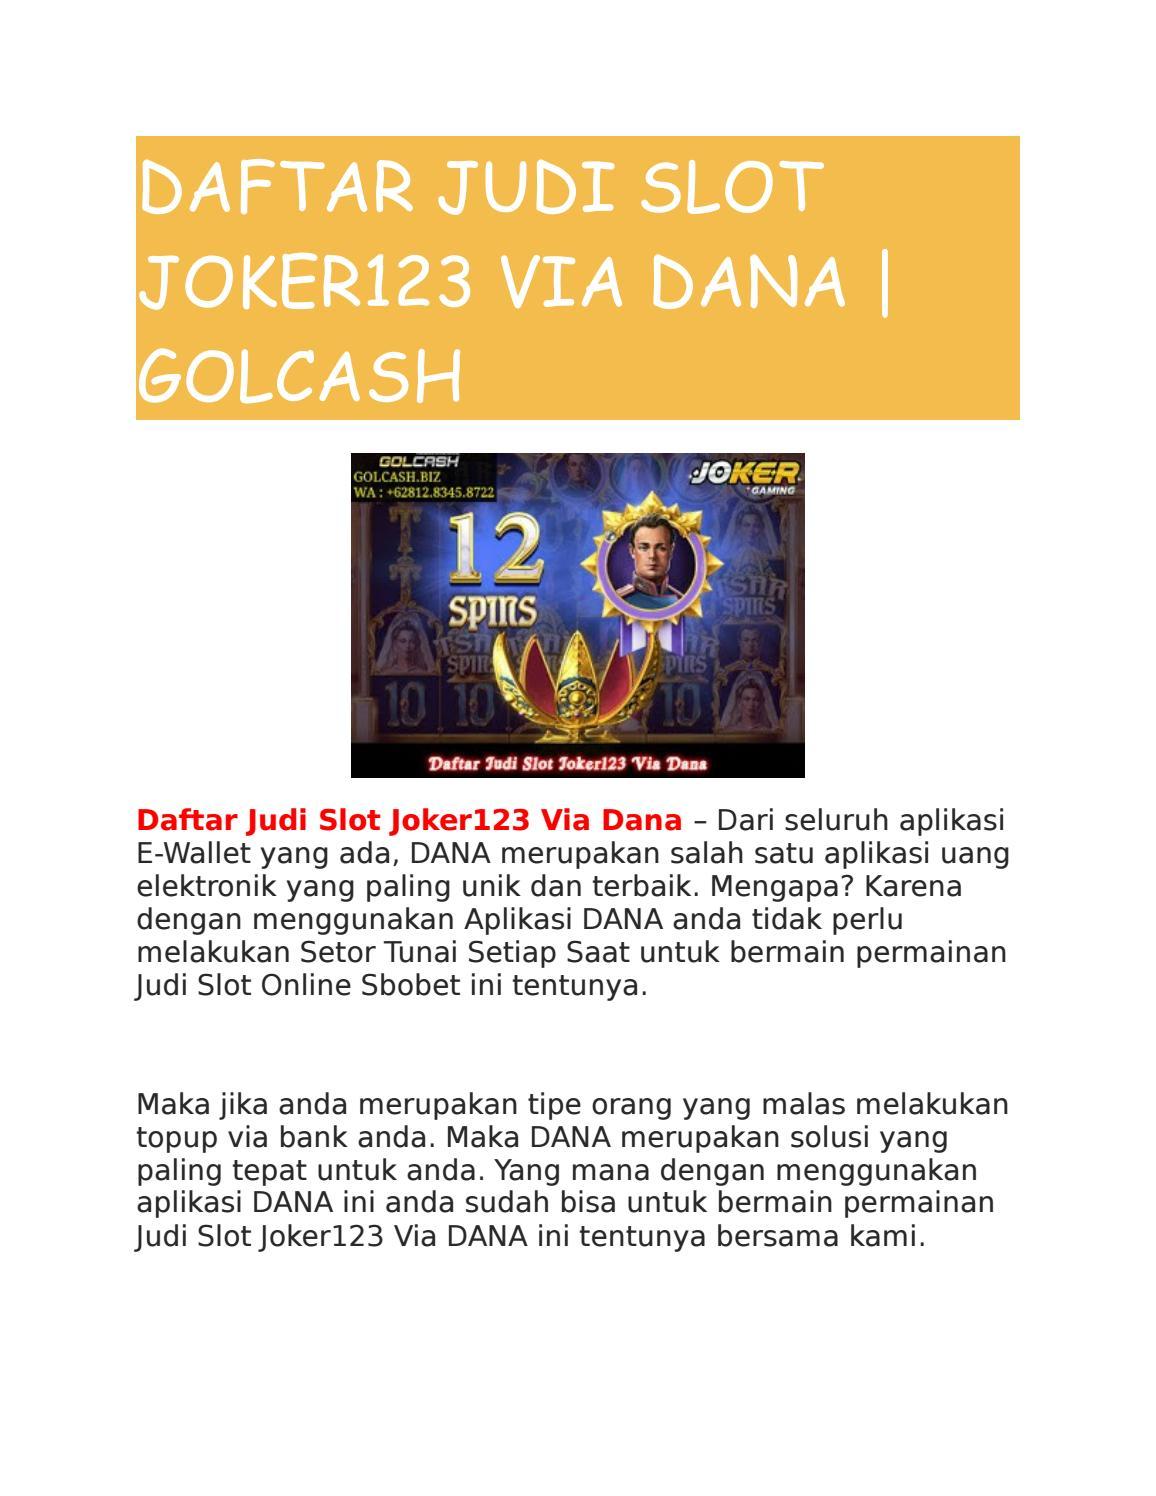 Daftar Judi Slot Joker123 Via Dana Golcash By Golcash Issuu